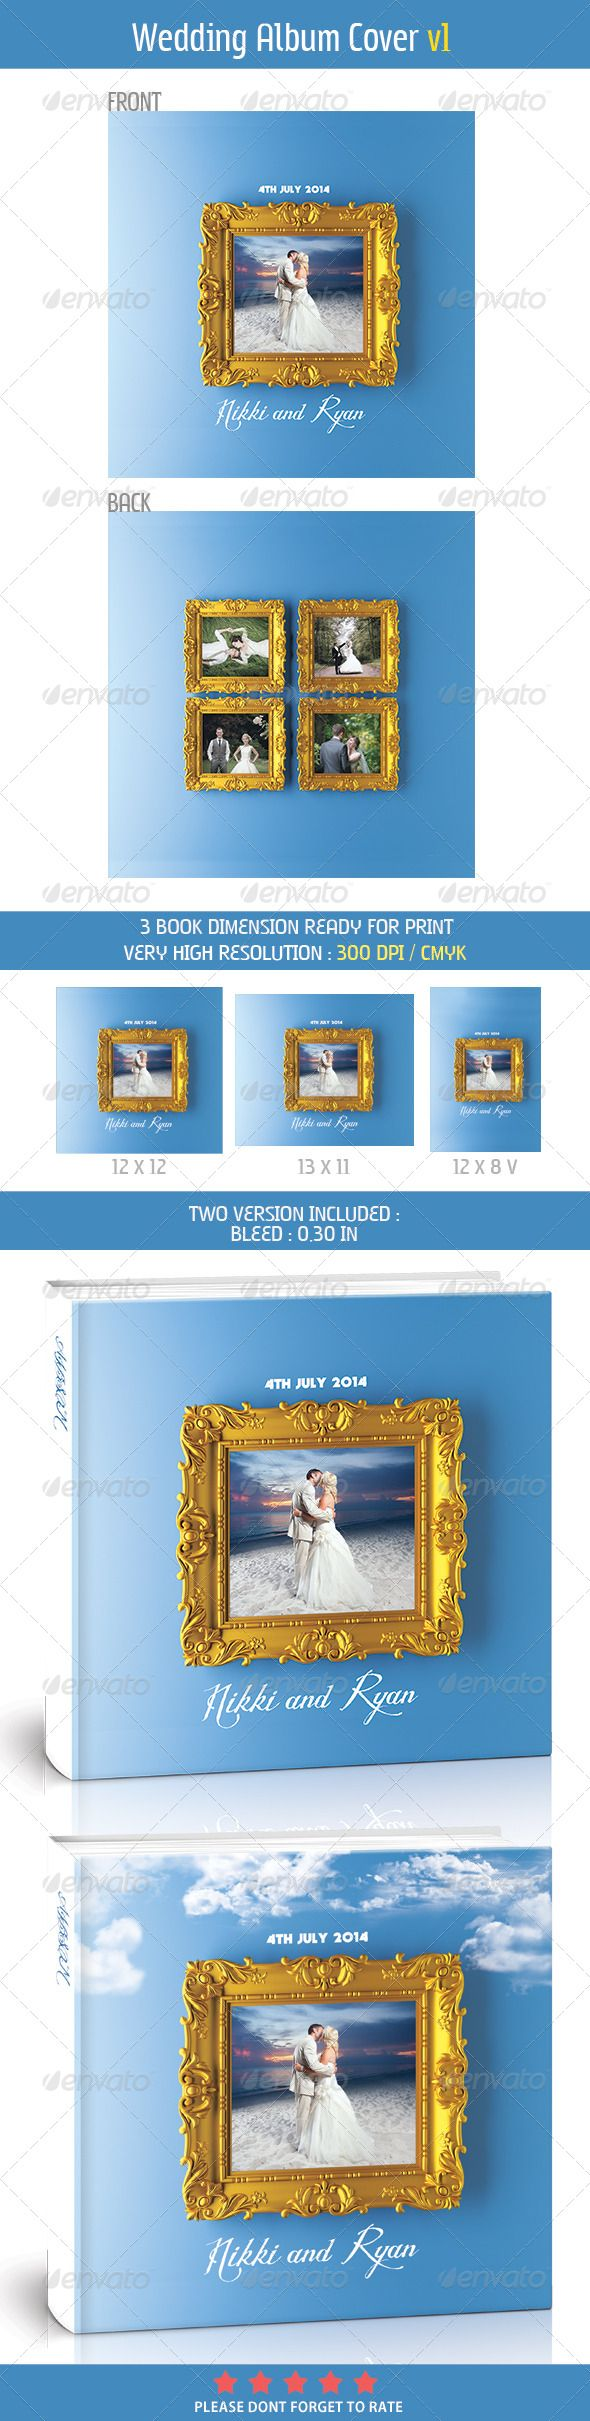 Wedding Photo Album Cover 01 — Photoshop PSD #photobook #Album Book • Available here → https://graphicriver.net/item/wedding-photo-album-cover-01/7441112?ref=pxcr